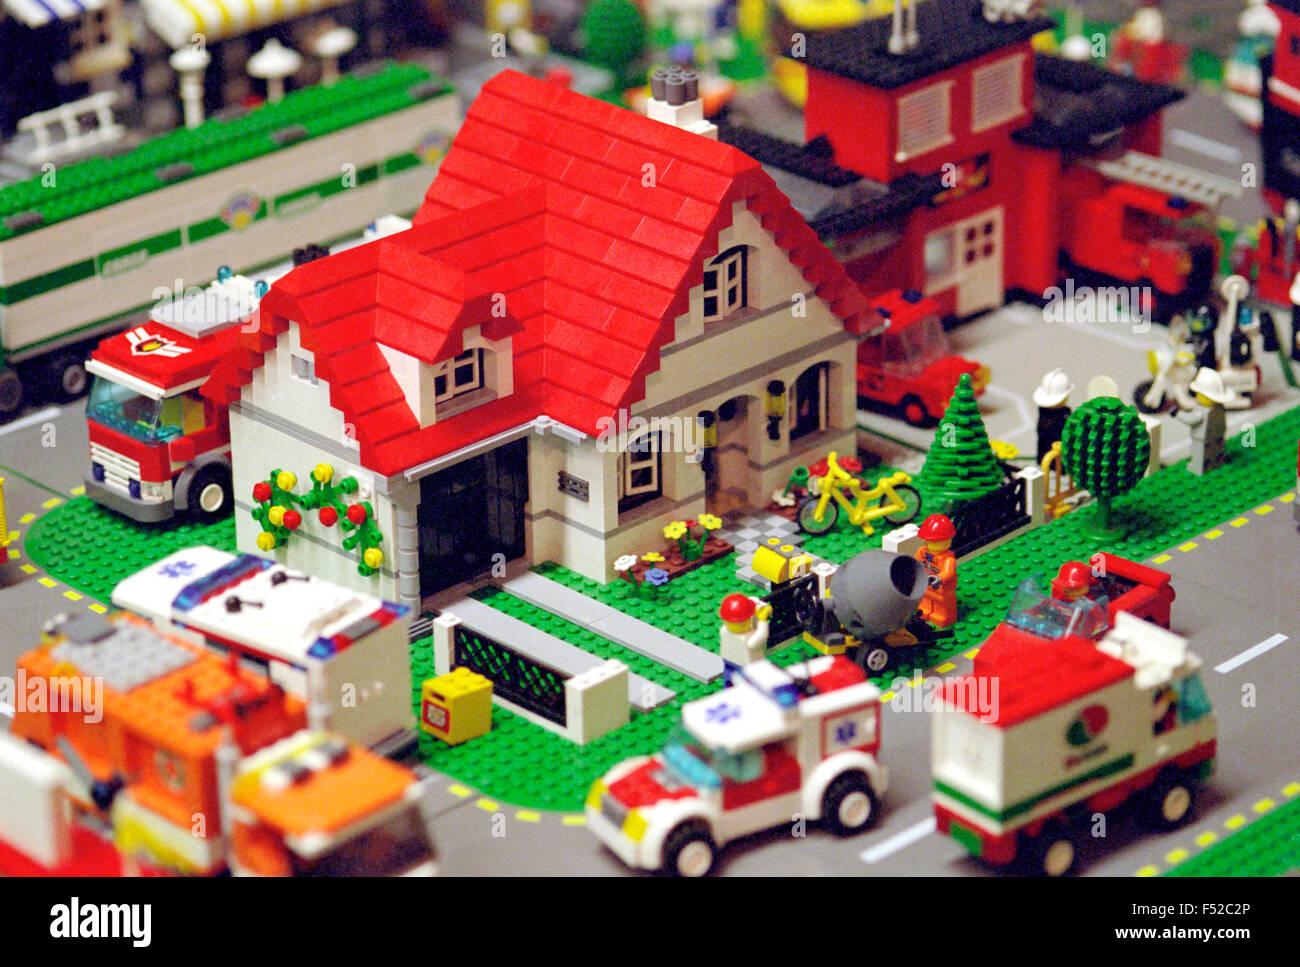 Casa de bloque de plástico juguetes. Foto de stock